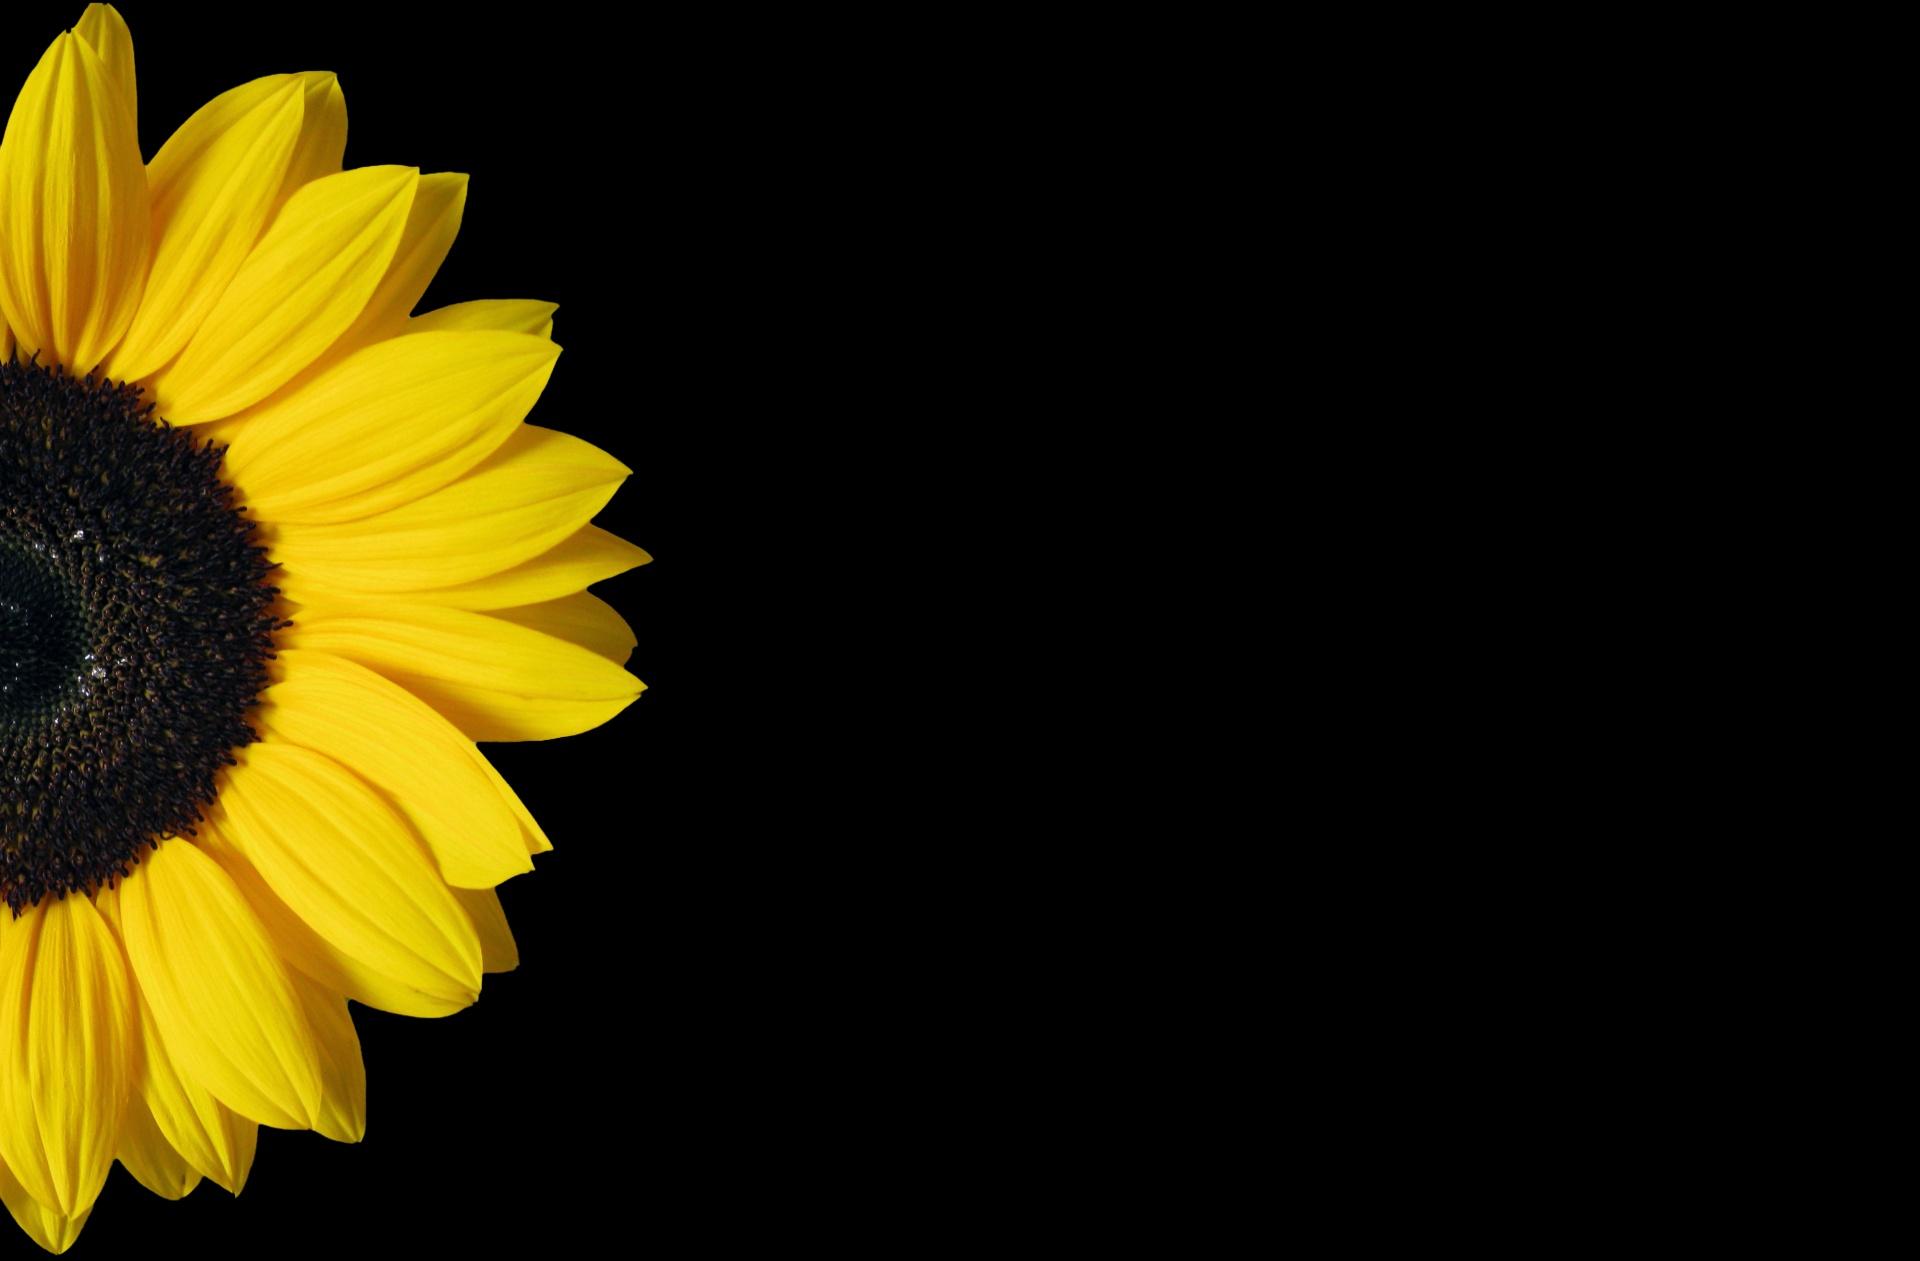 Sunflower on black photo